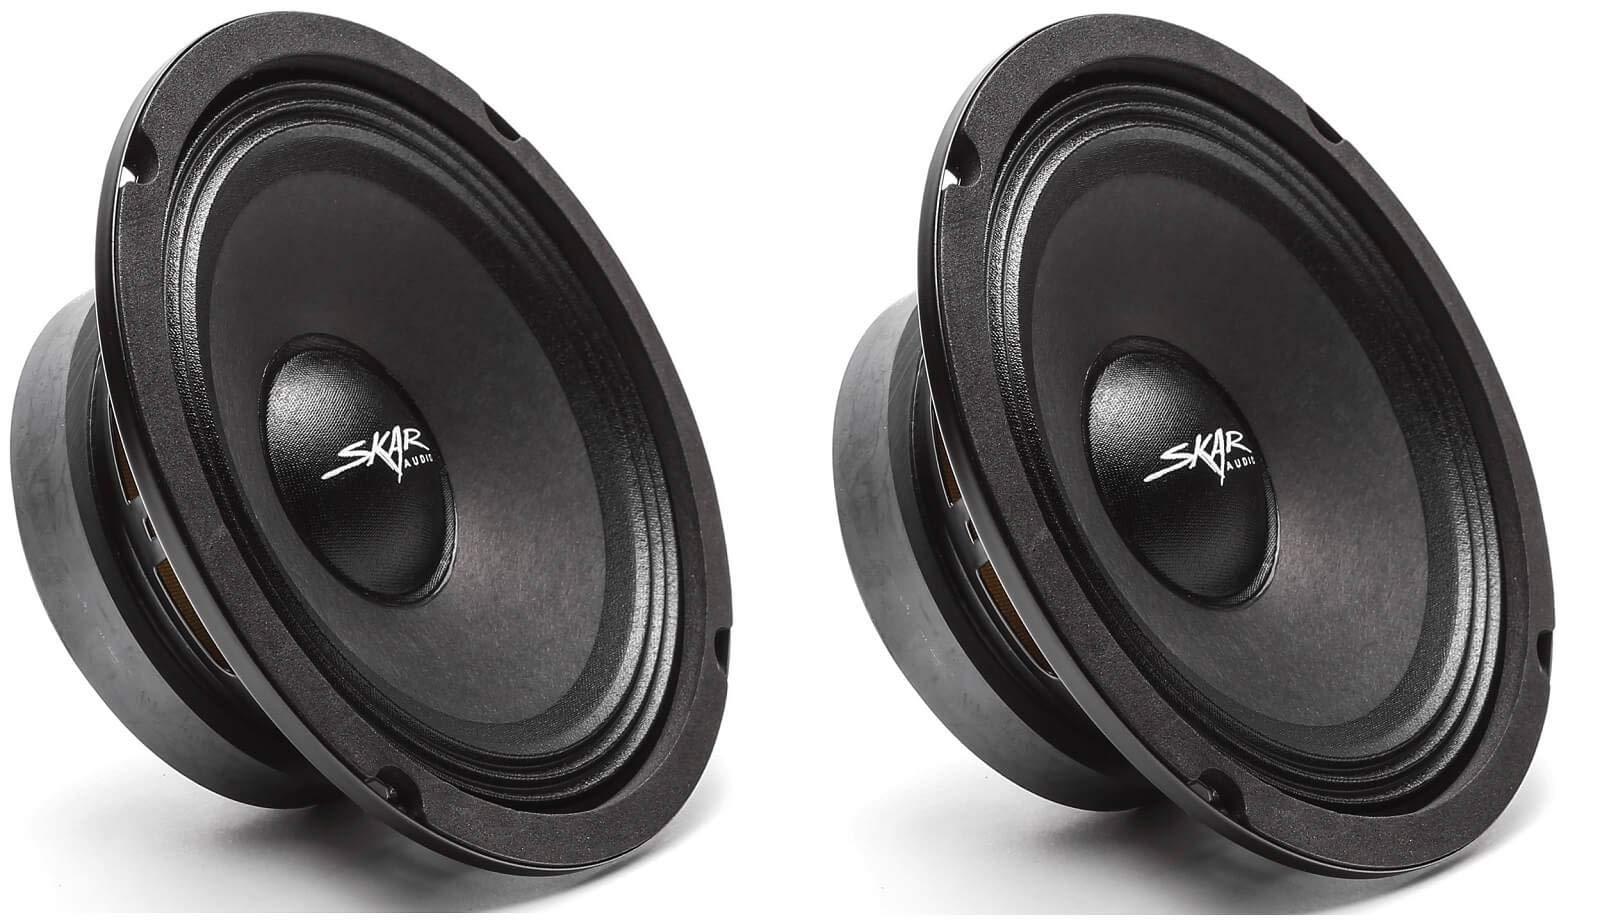 (2) Skar Audio FSX65-4 300-Watt 6.5-Inch 4 Ohm MID-Range Loudspeakers - 2 Speakers by Skar Audio